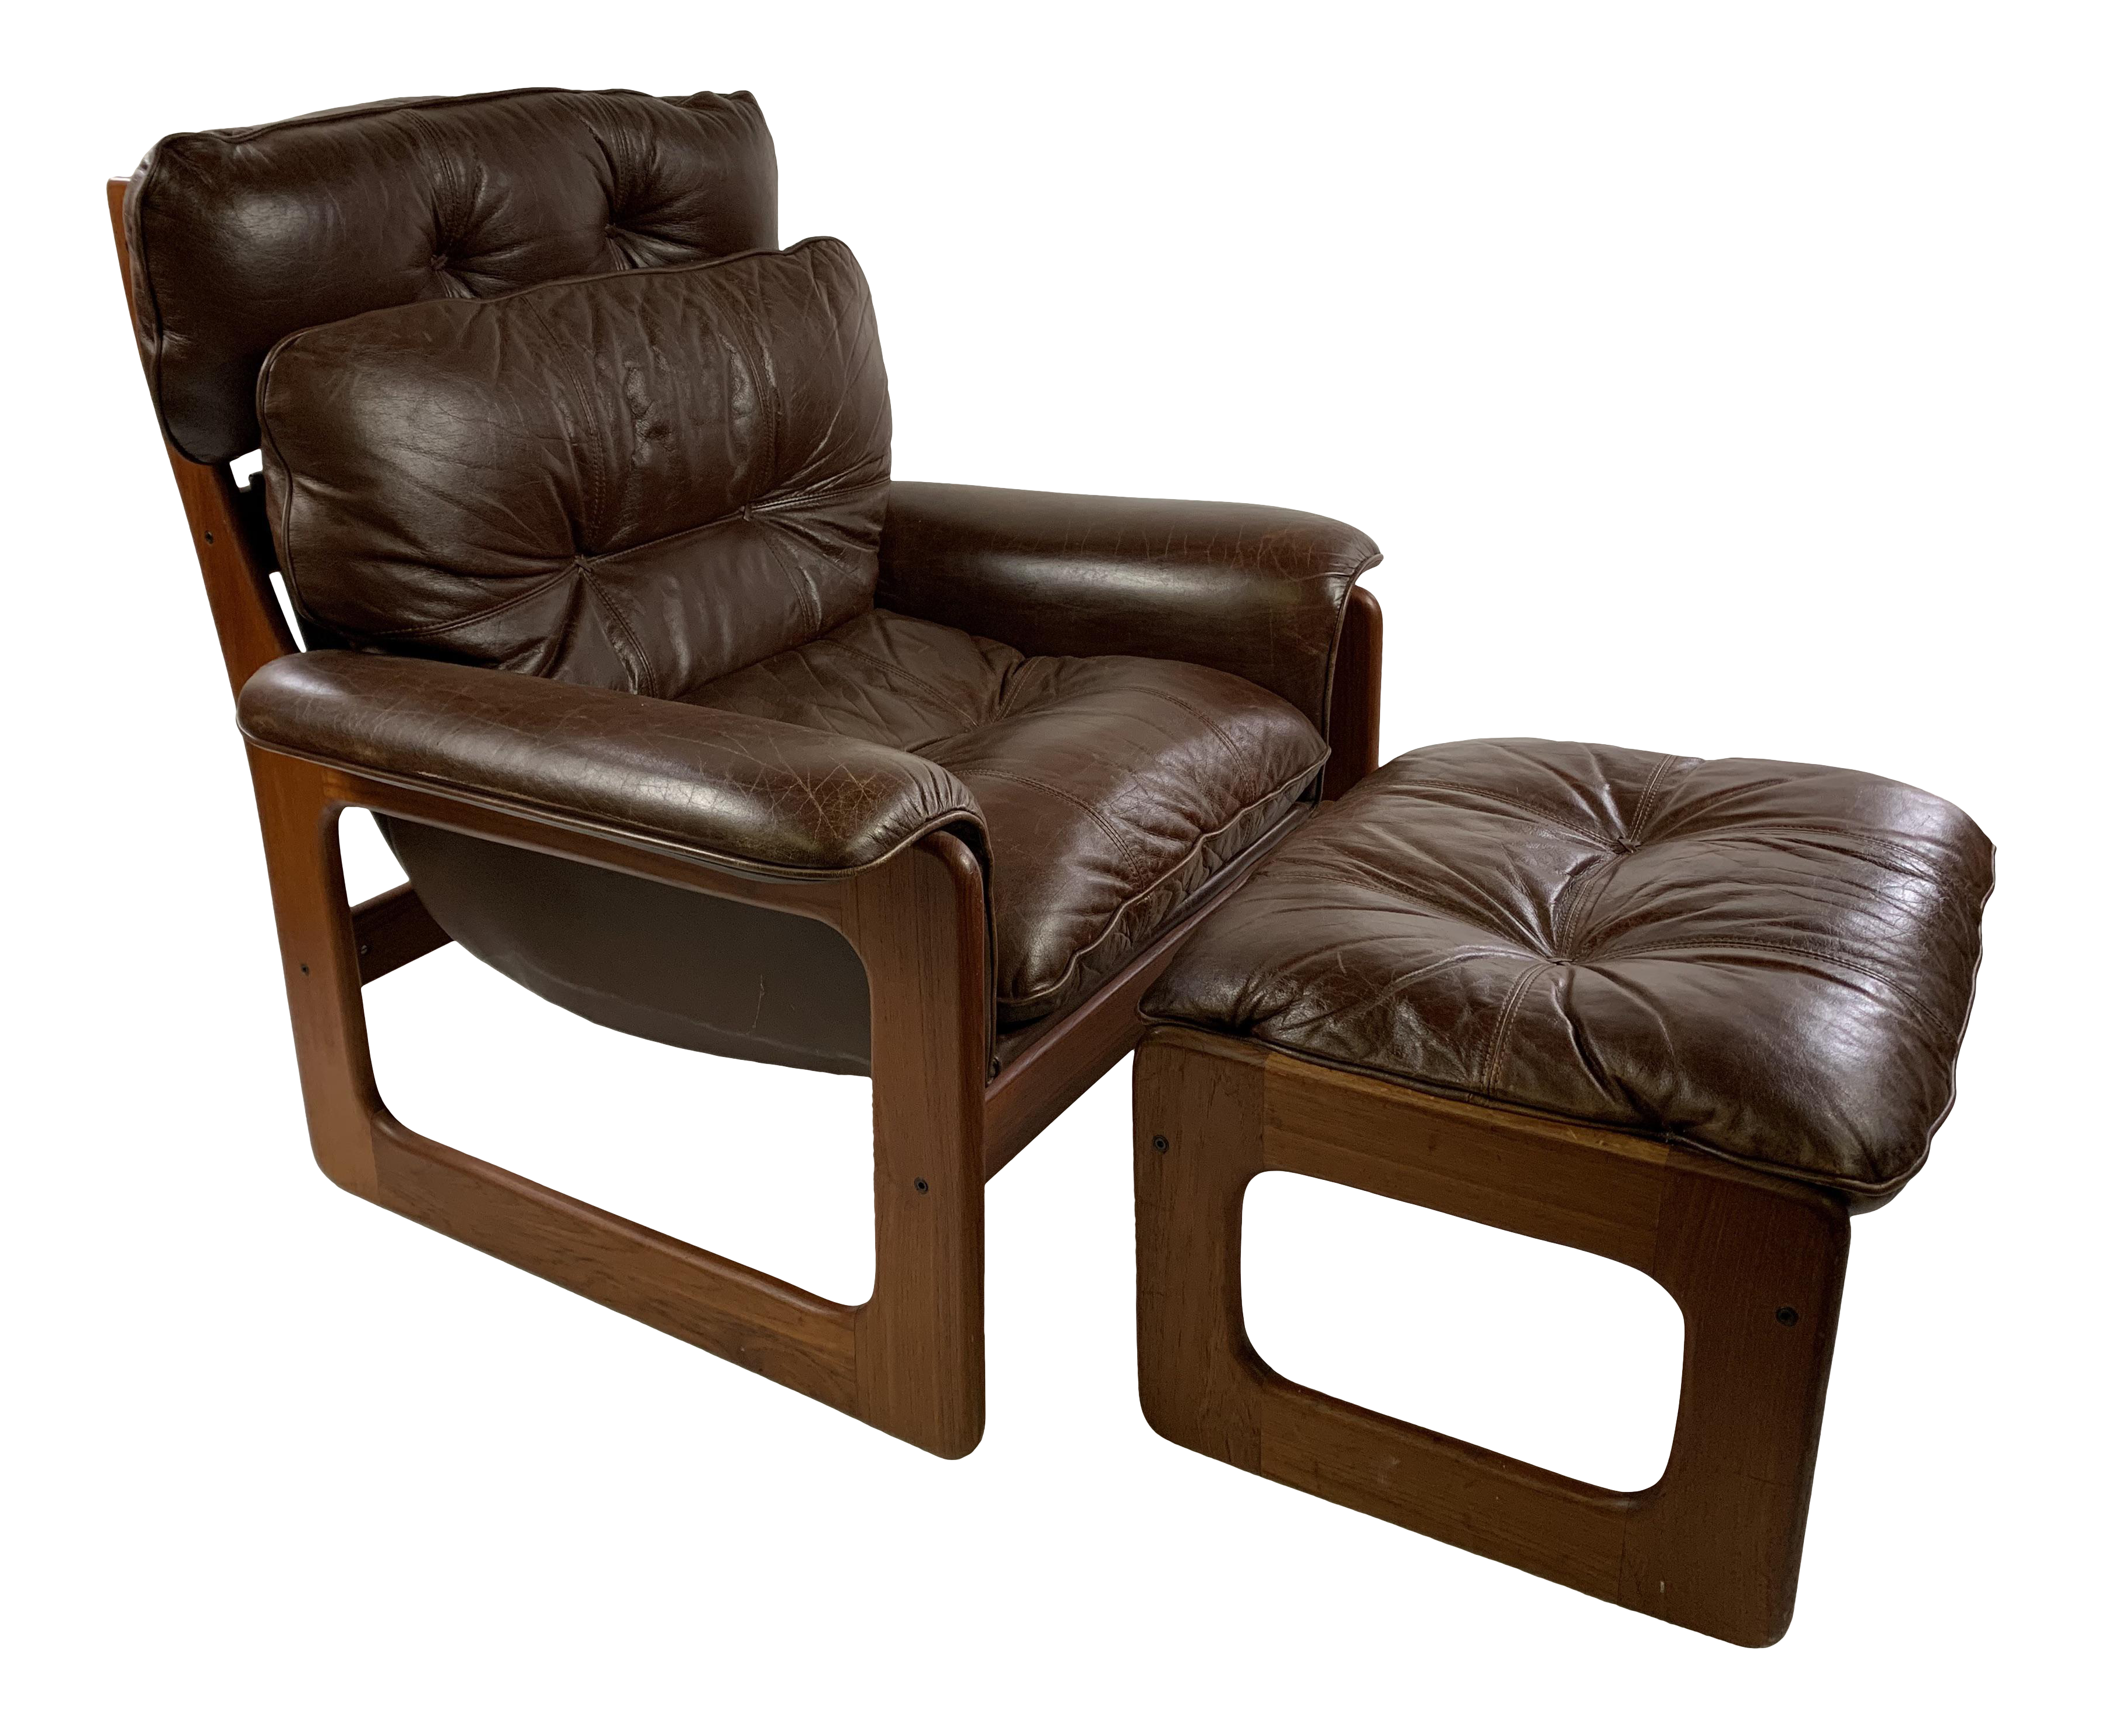 Mid Century Danish Teak Leather Lounge Sling Chair Foot Stool